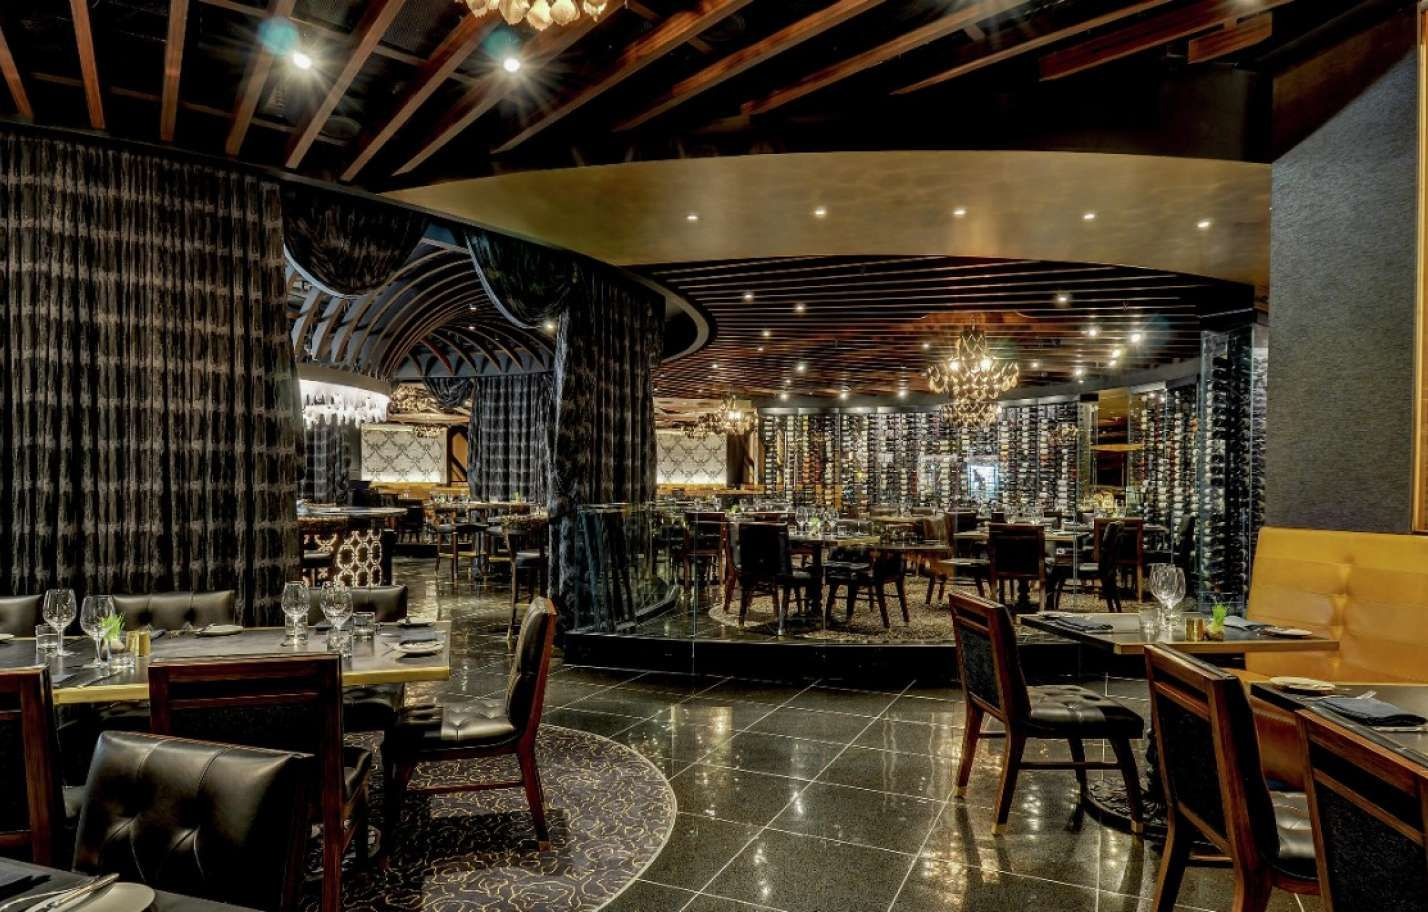 Steakhouse Upper West Side